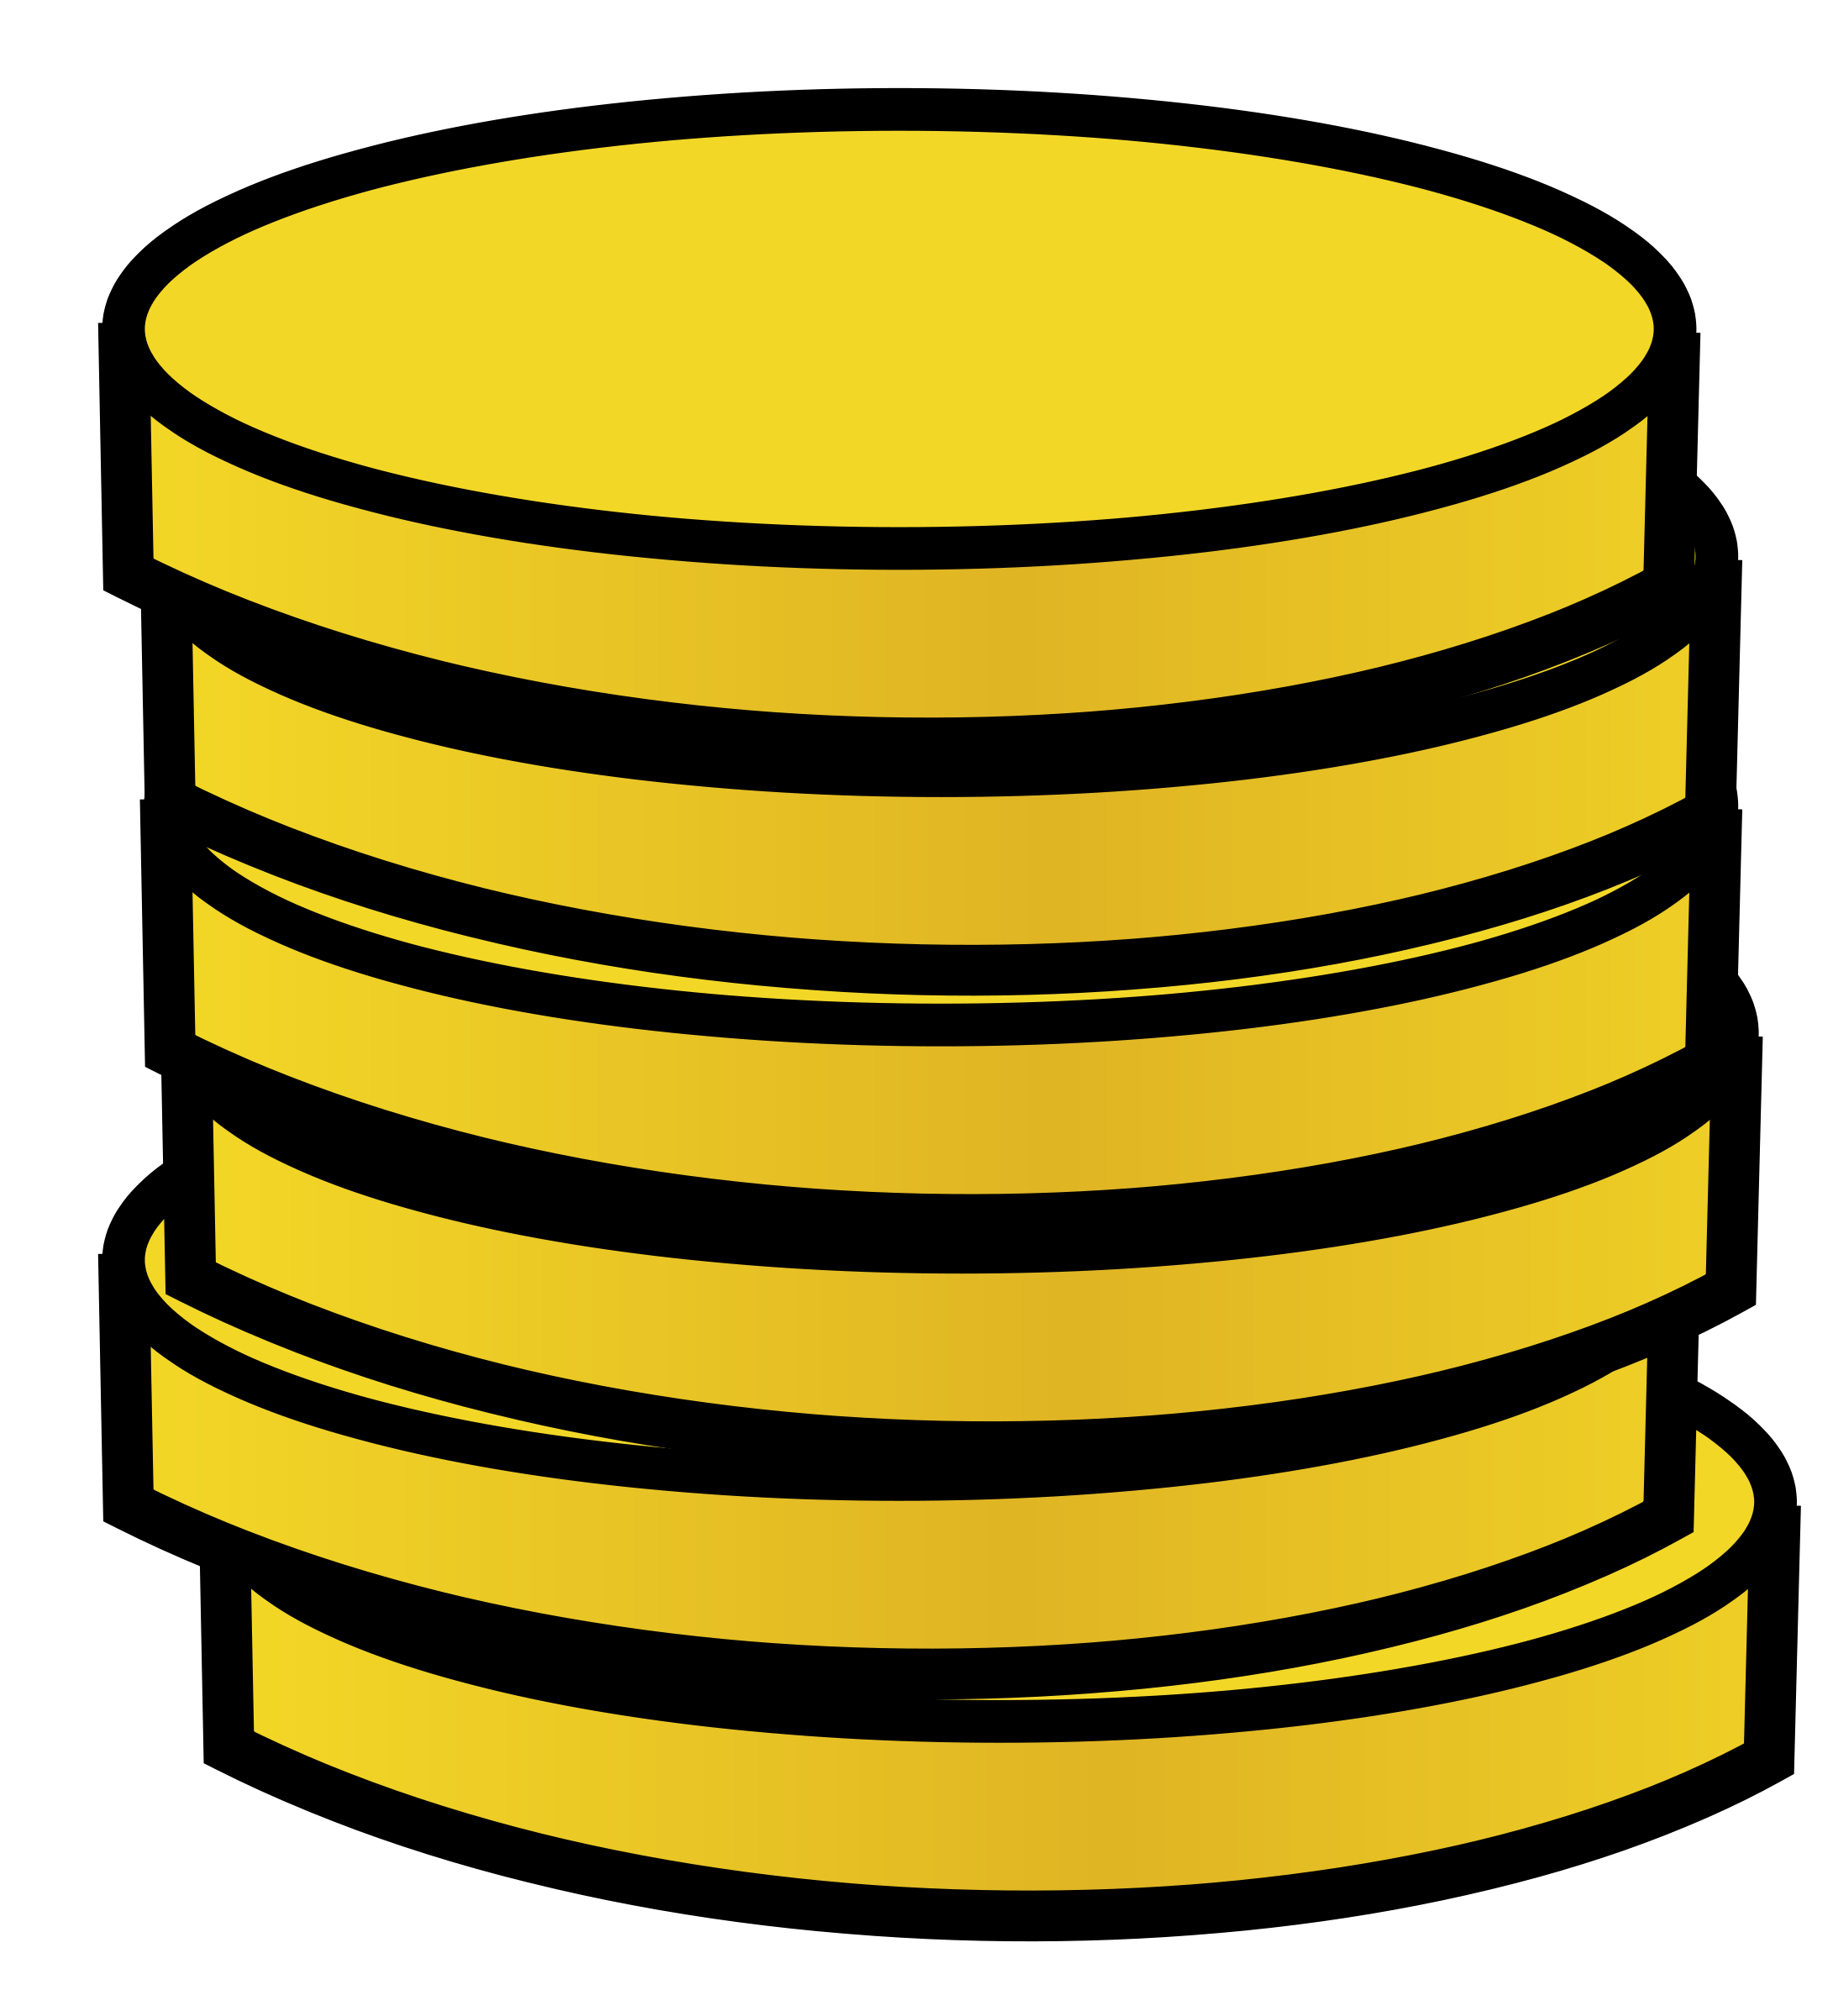 2182x2400 Gold Coin Clipart Clipart Panda